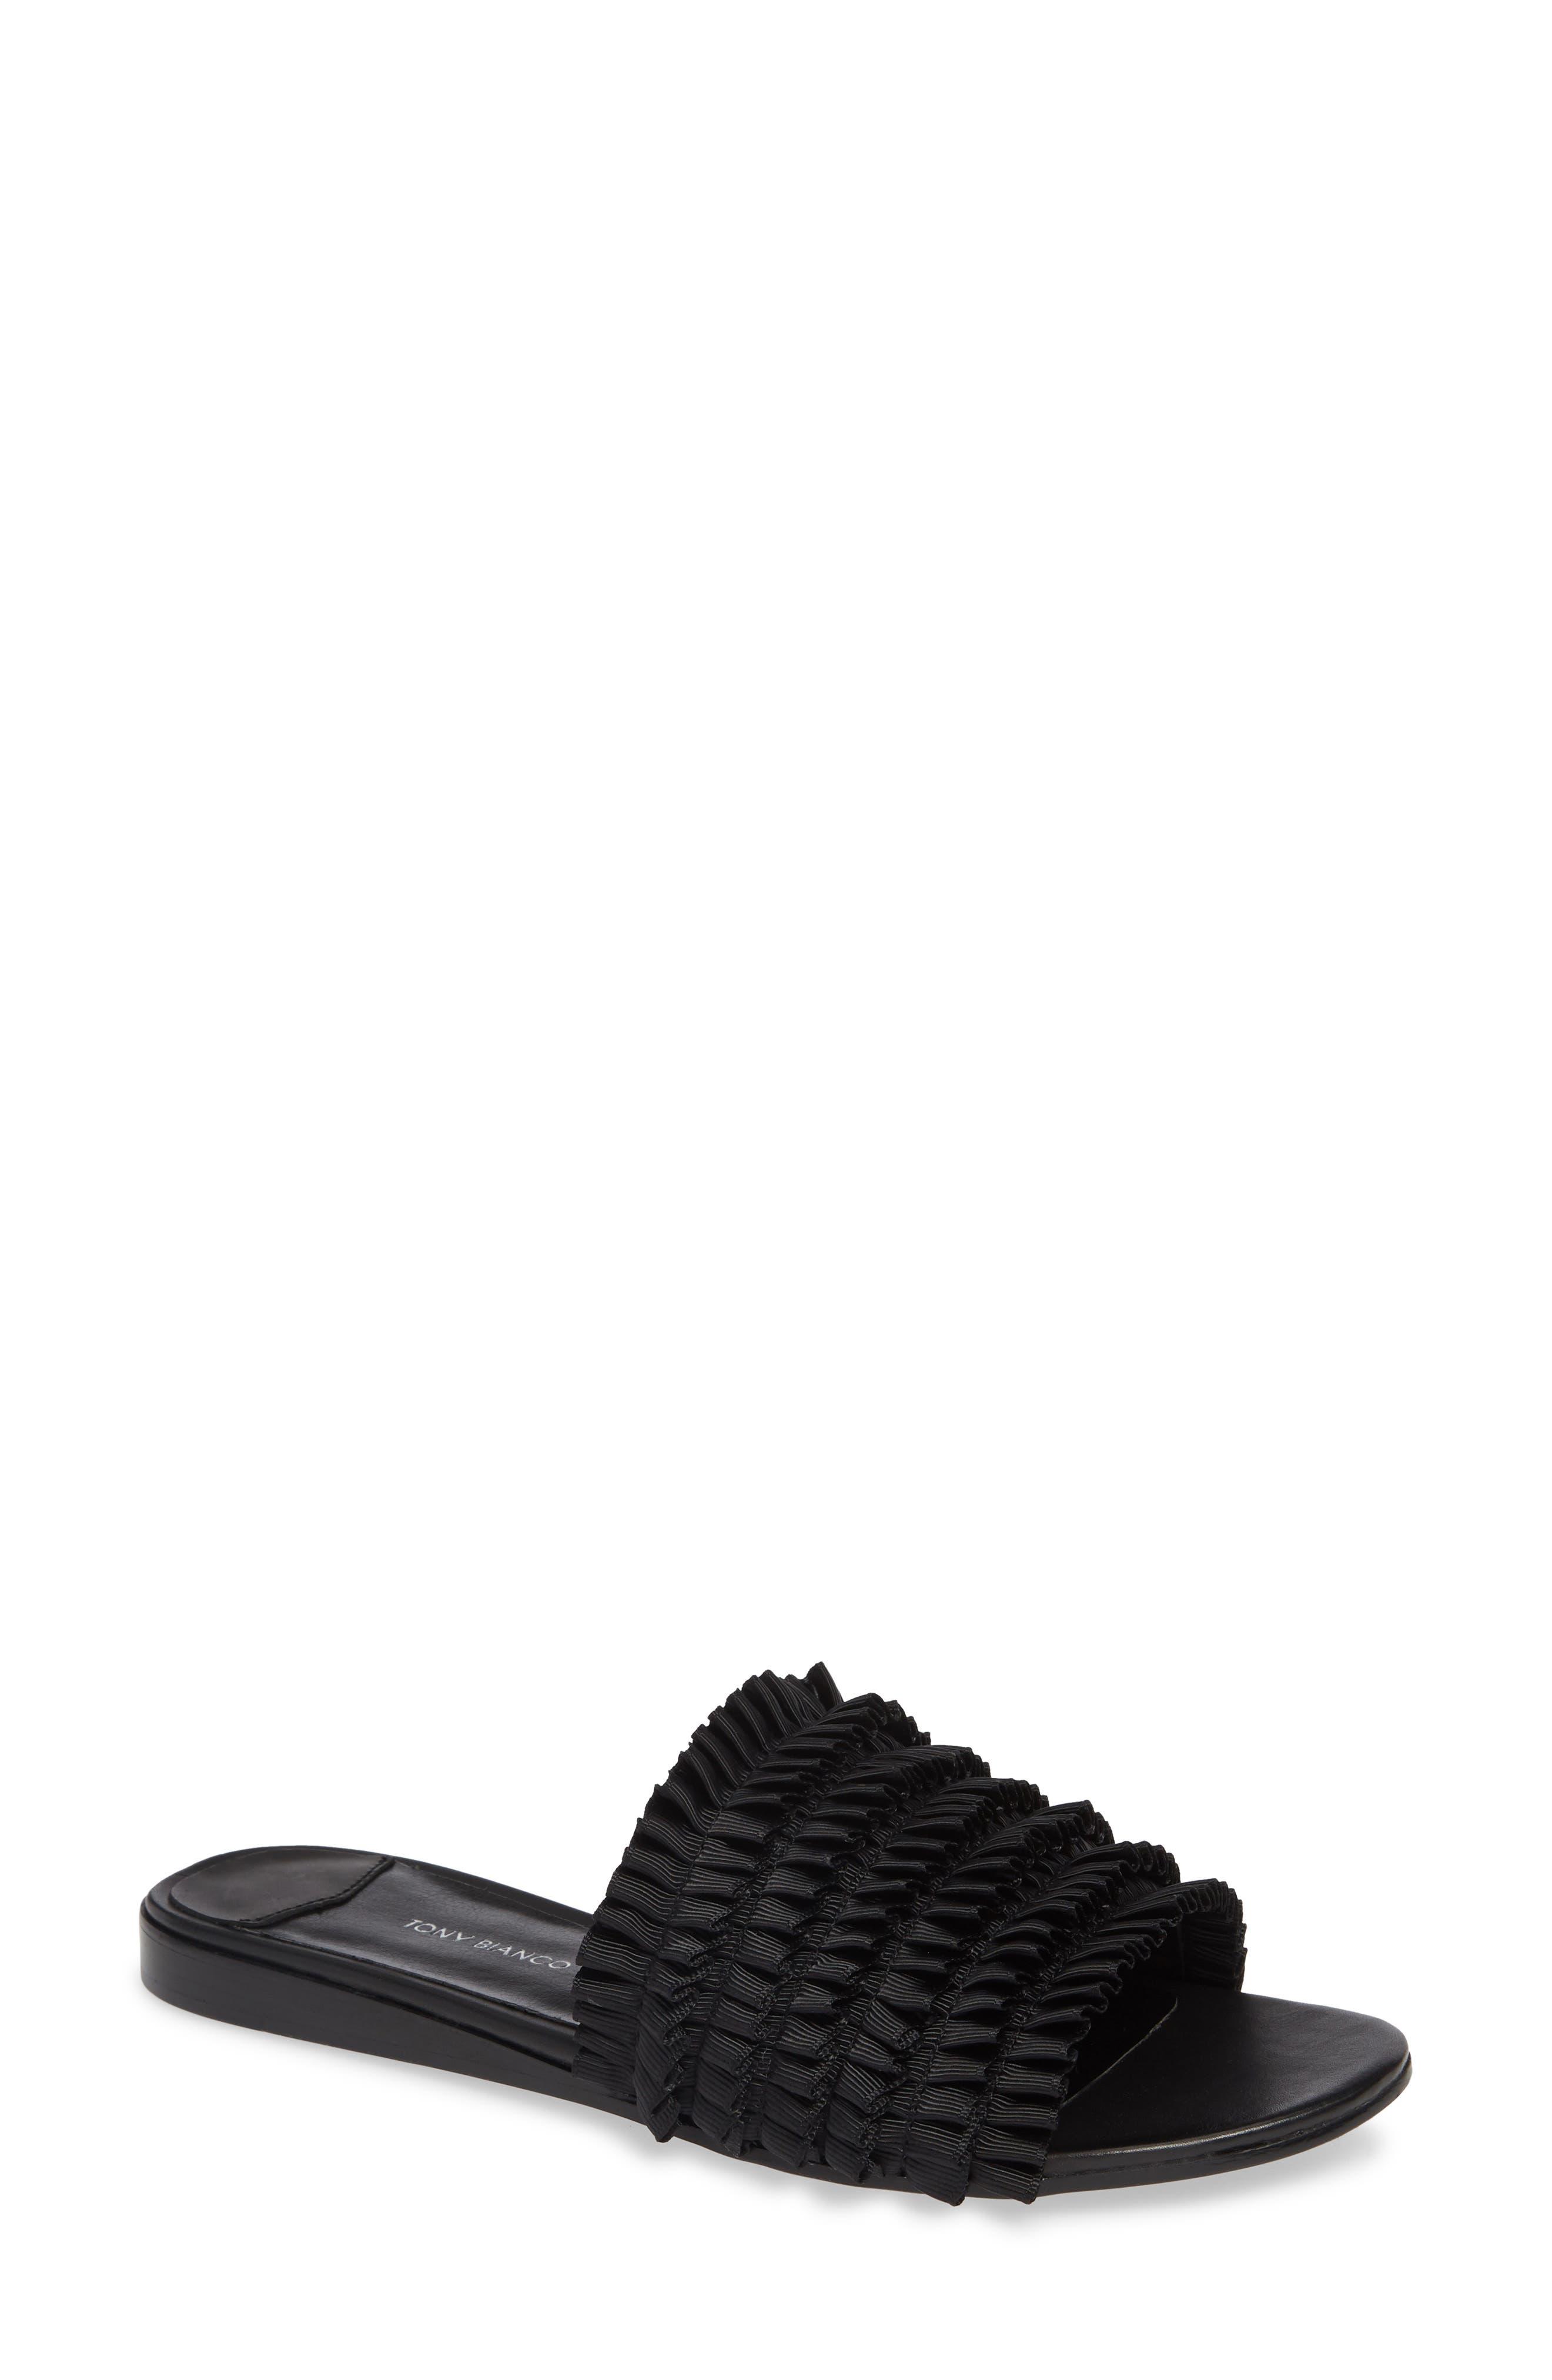 Jerzy Slide Sandal,                         Main,                         color, BLACK FABRIC